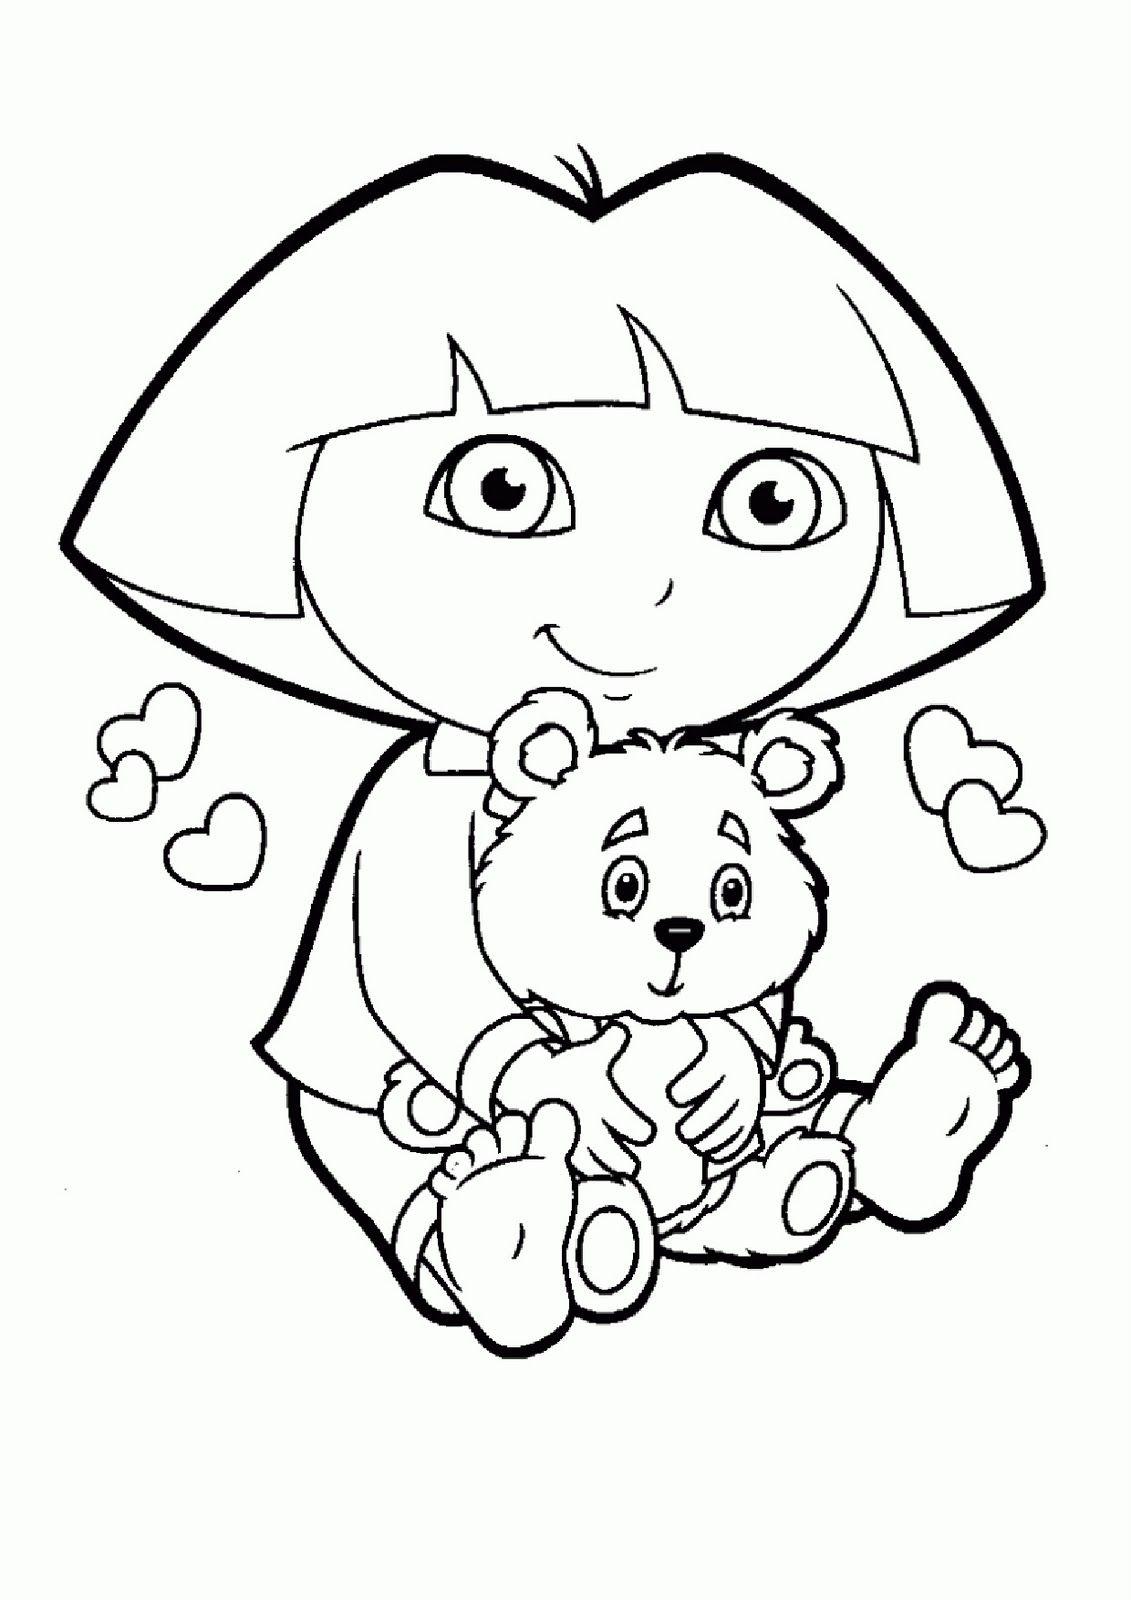 Dora la exploradora y su osito | dibujos | Pinterest | Dora la ...